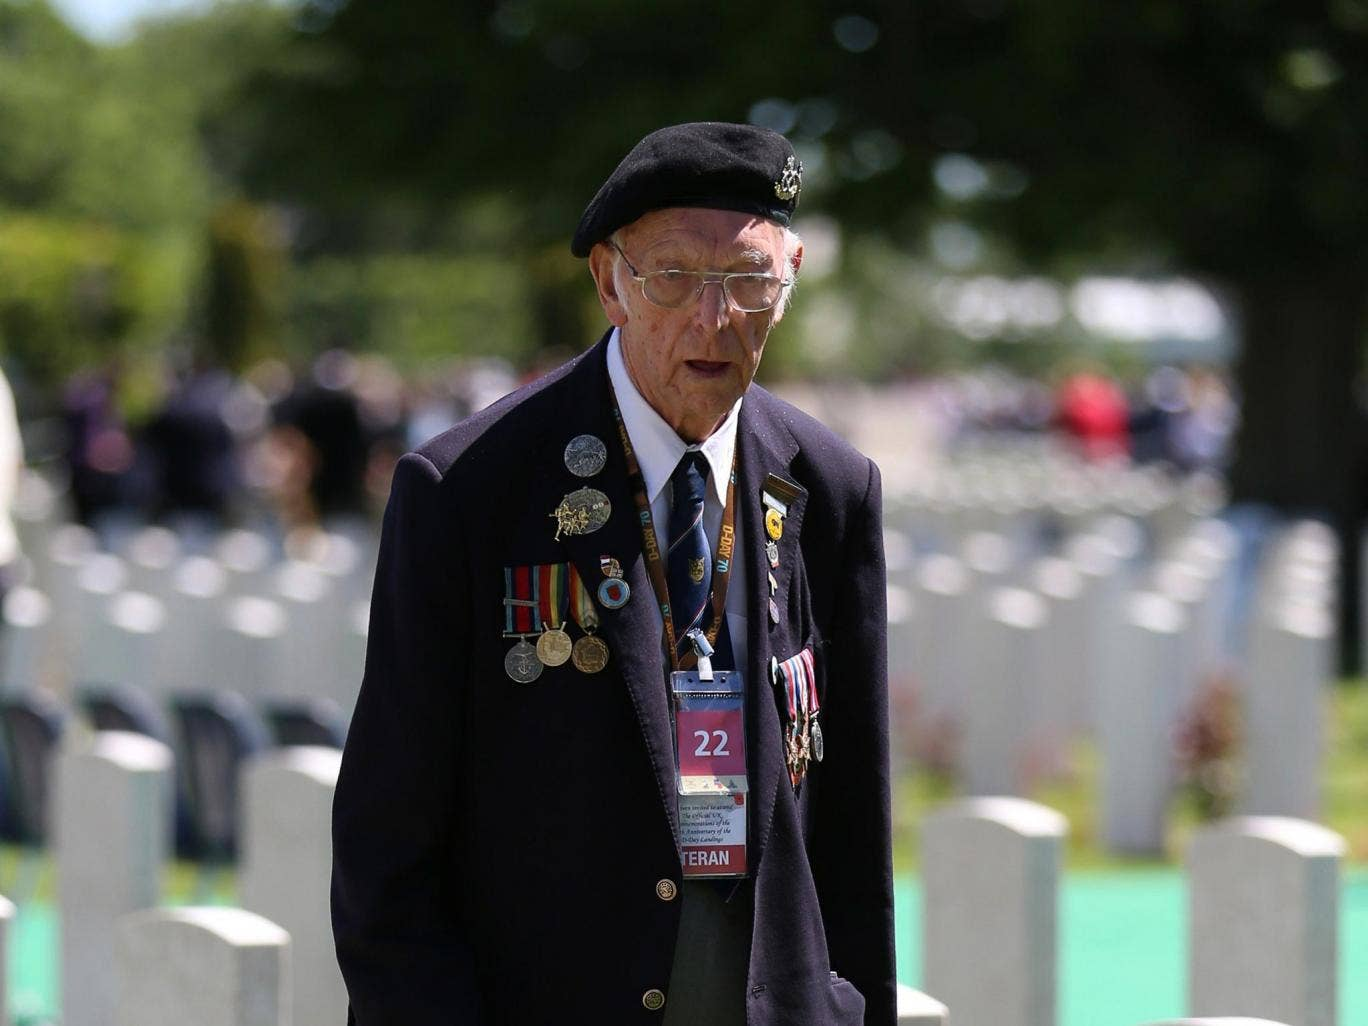 Veteran Bert Banford, 90, in Bayeux Cemetery after the memorial service